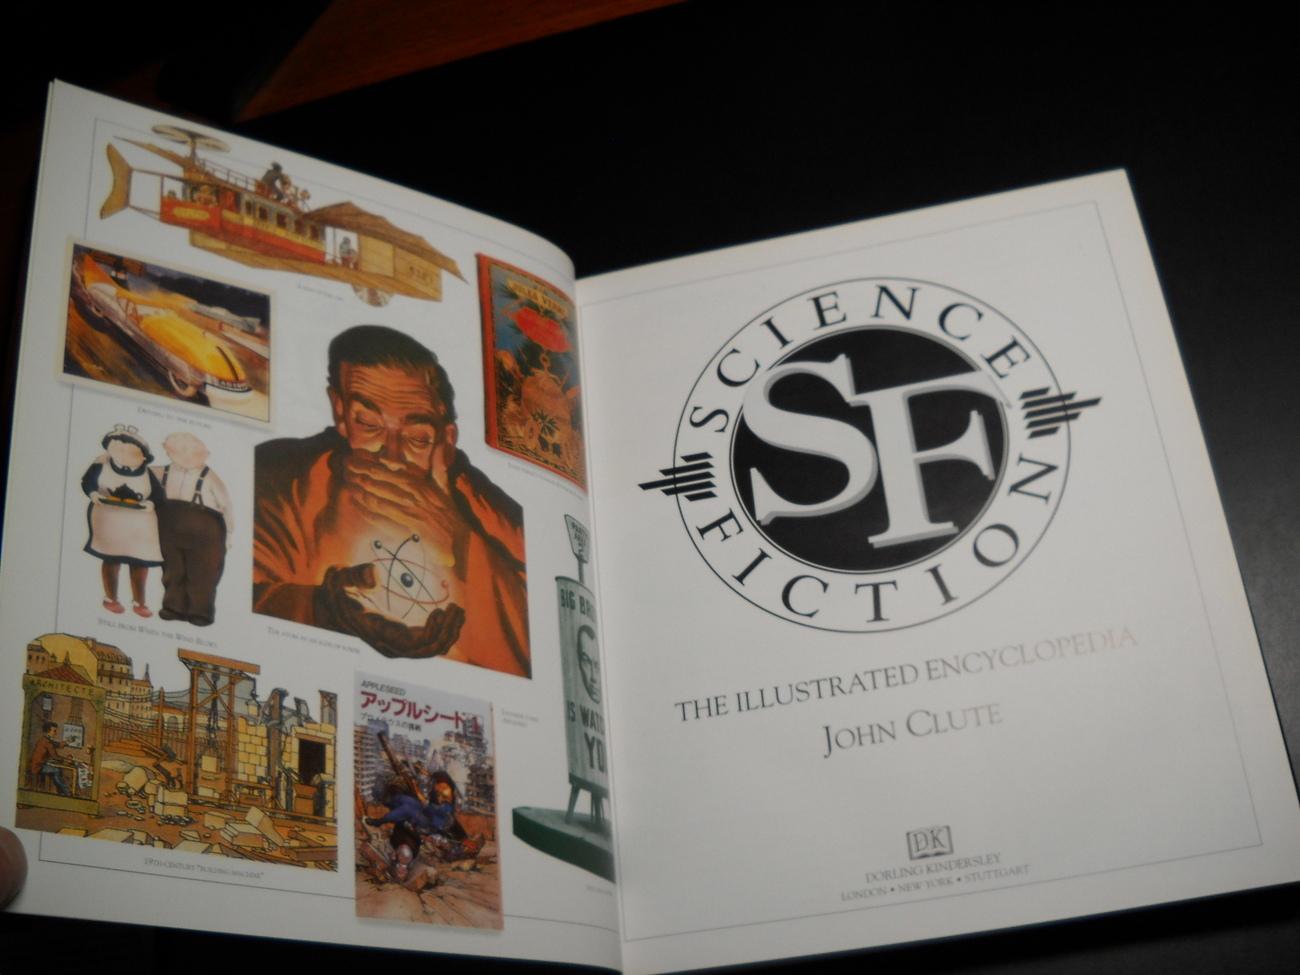 Science Fiction The Illustrated Encyclopedia John Clute 1995 Dorling Kindersley